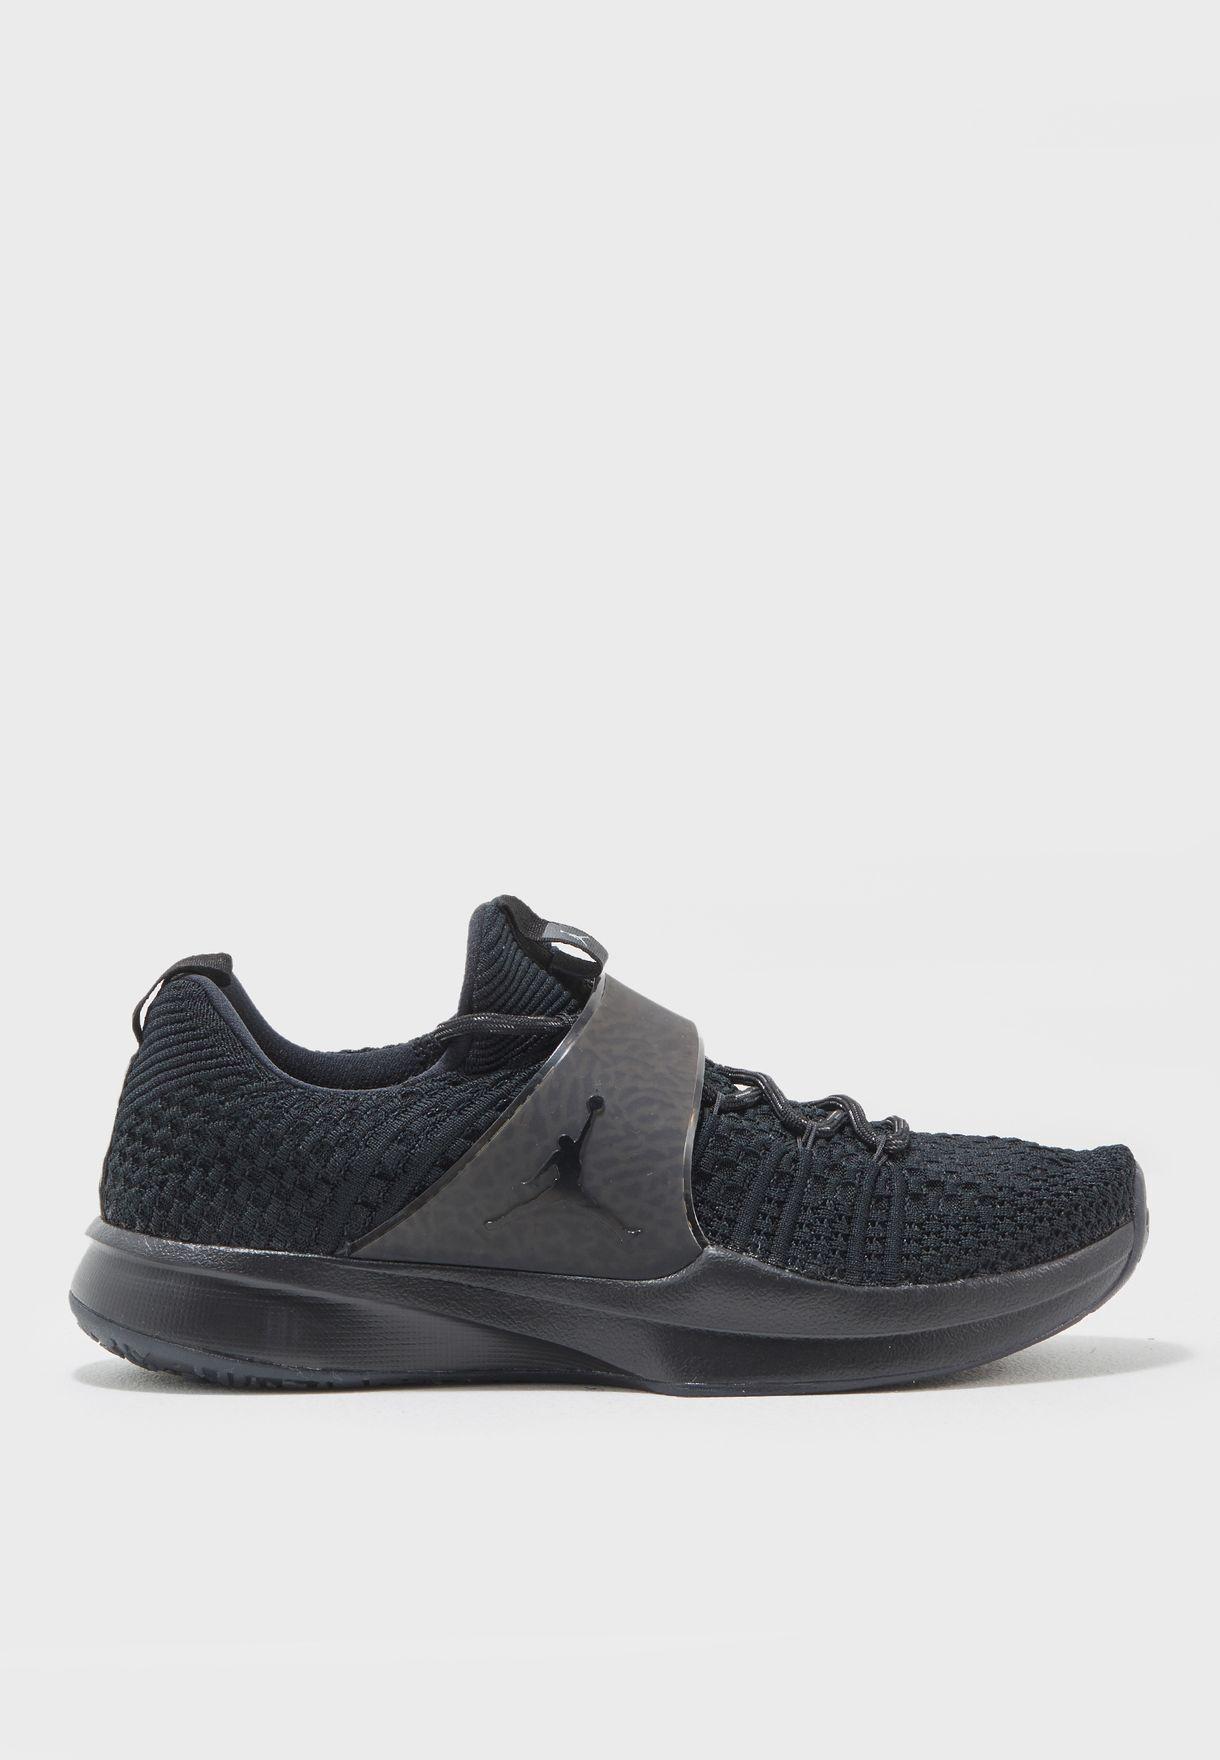 0c5c4267bf0f Shop Nike black Jordan Trainer 2 Flyknit 921210-013 for Men in UAE ...